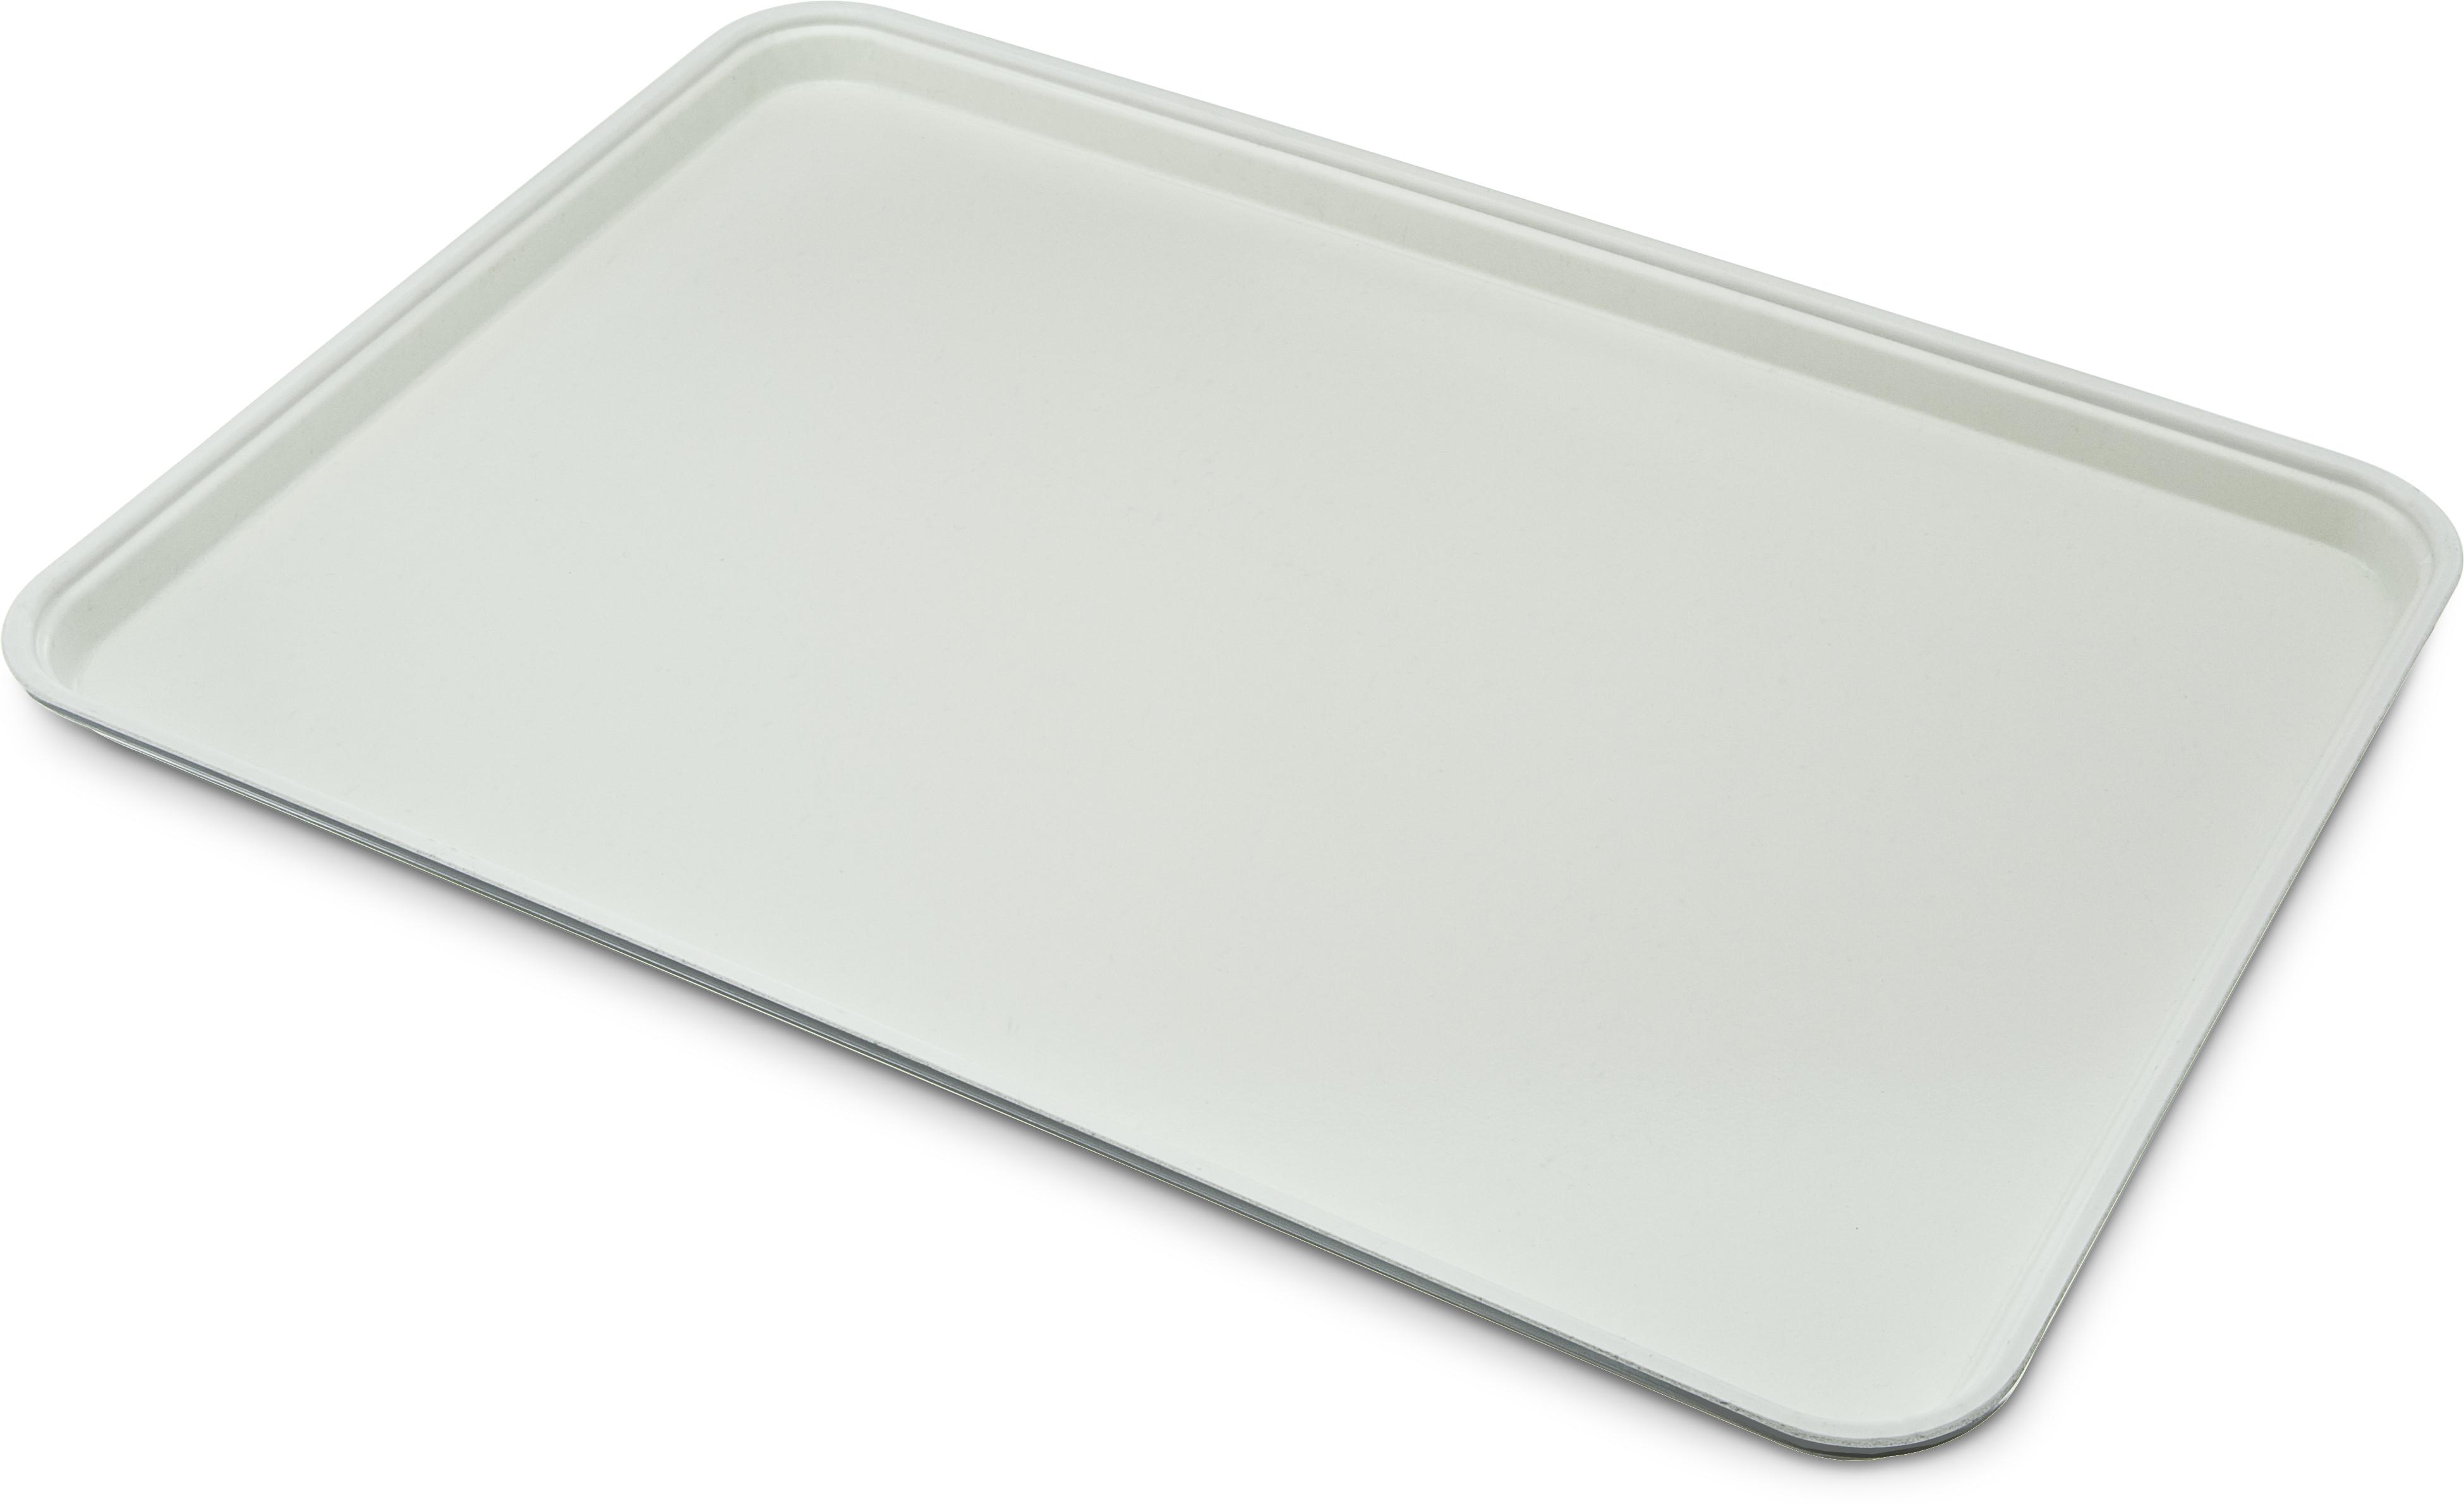 Glasteel Tray Display/Bakery 17.9 x 25.6 - Gray